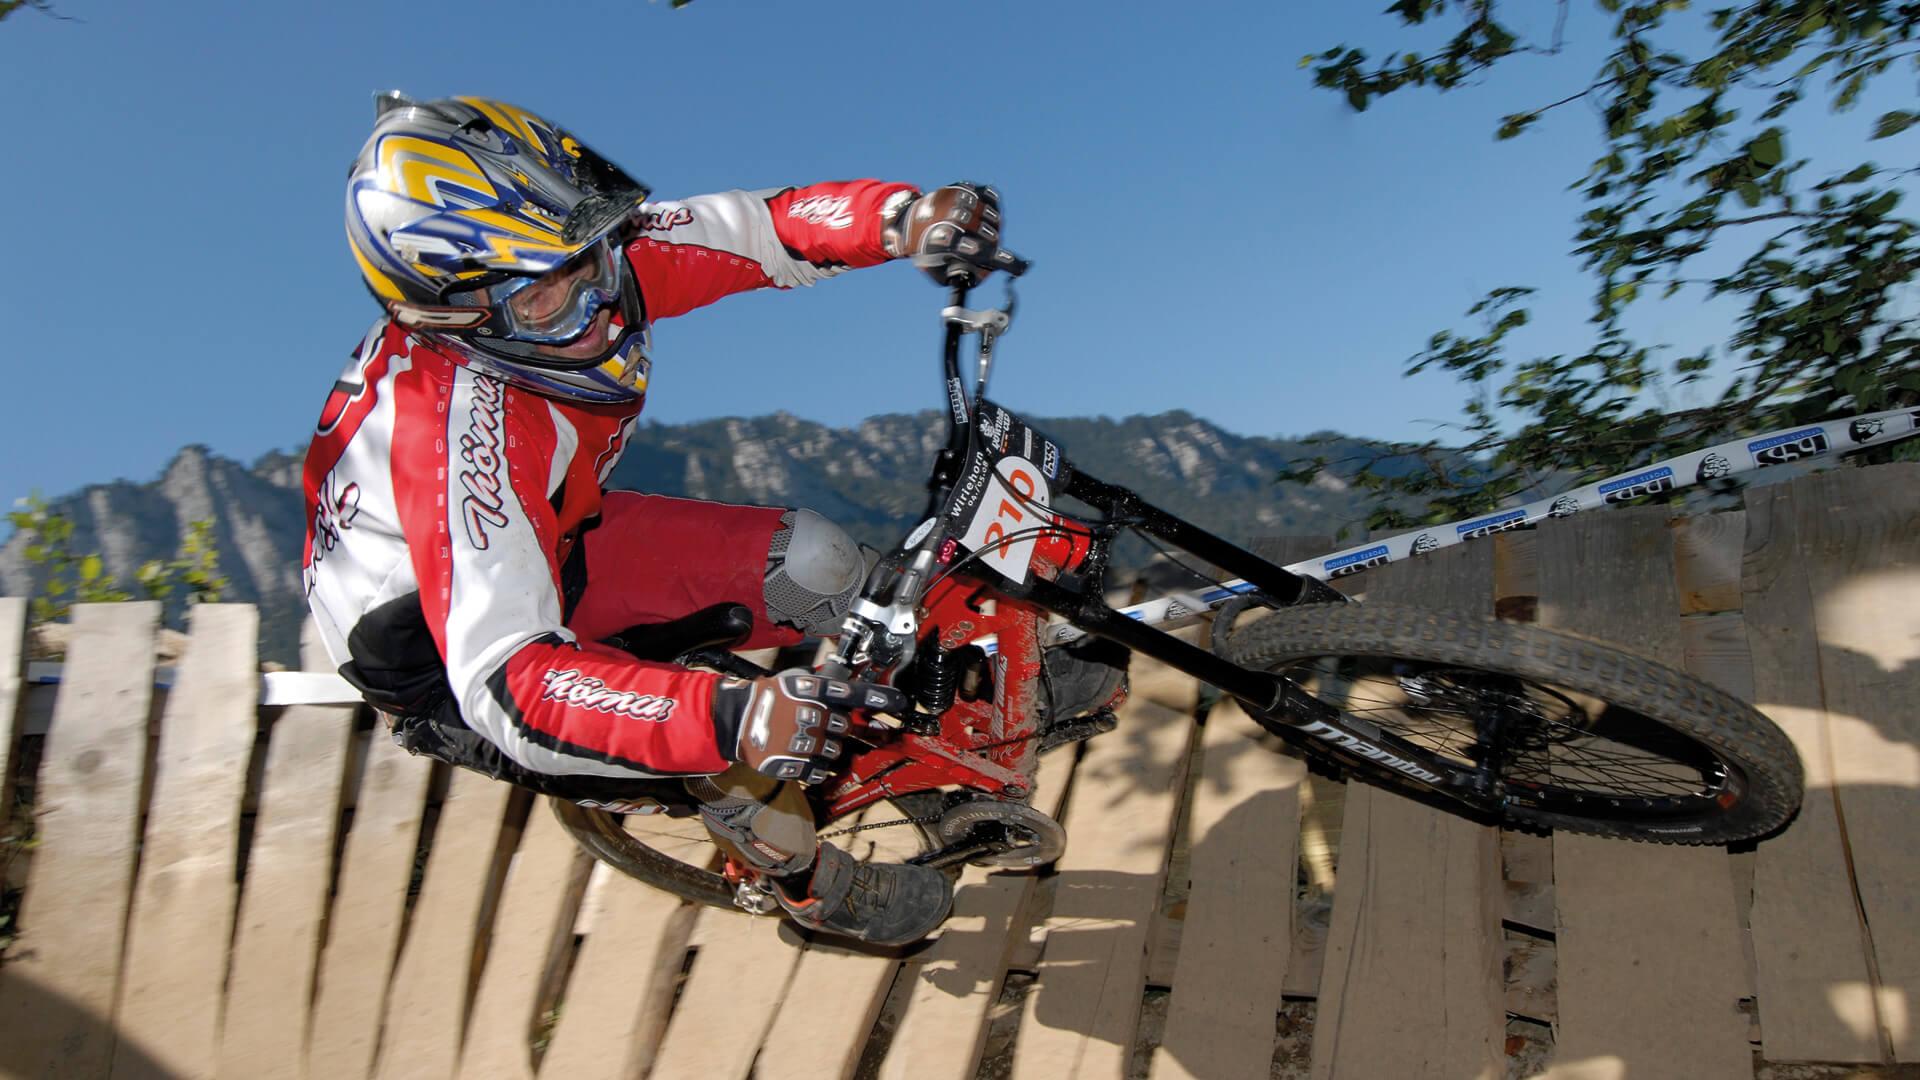 wiriehorn-downhill-bike-sport-sommer-rasant